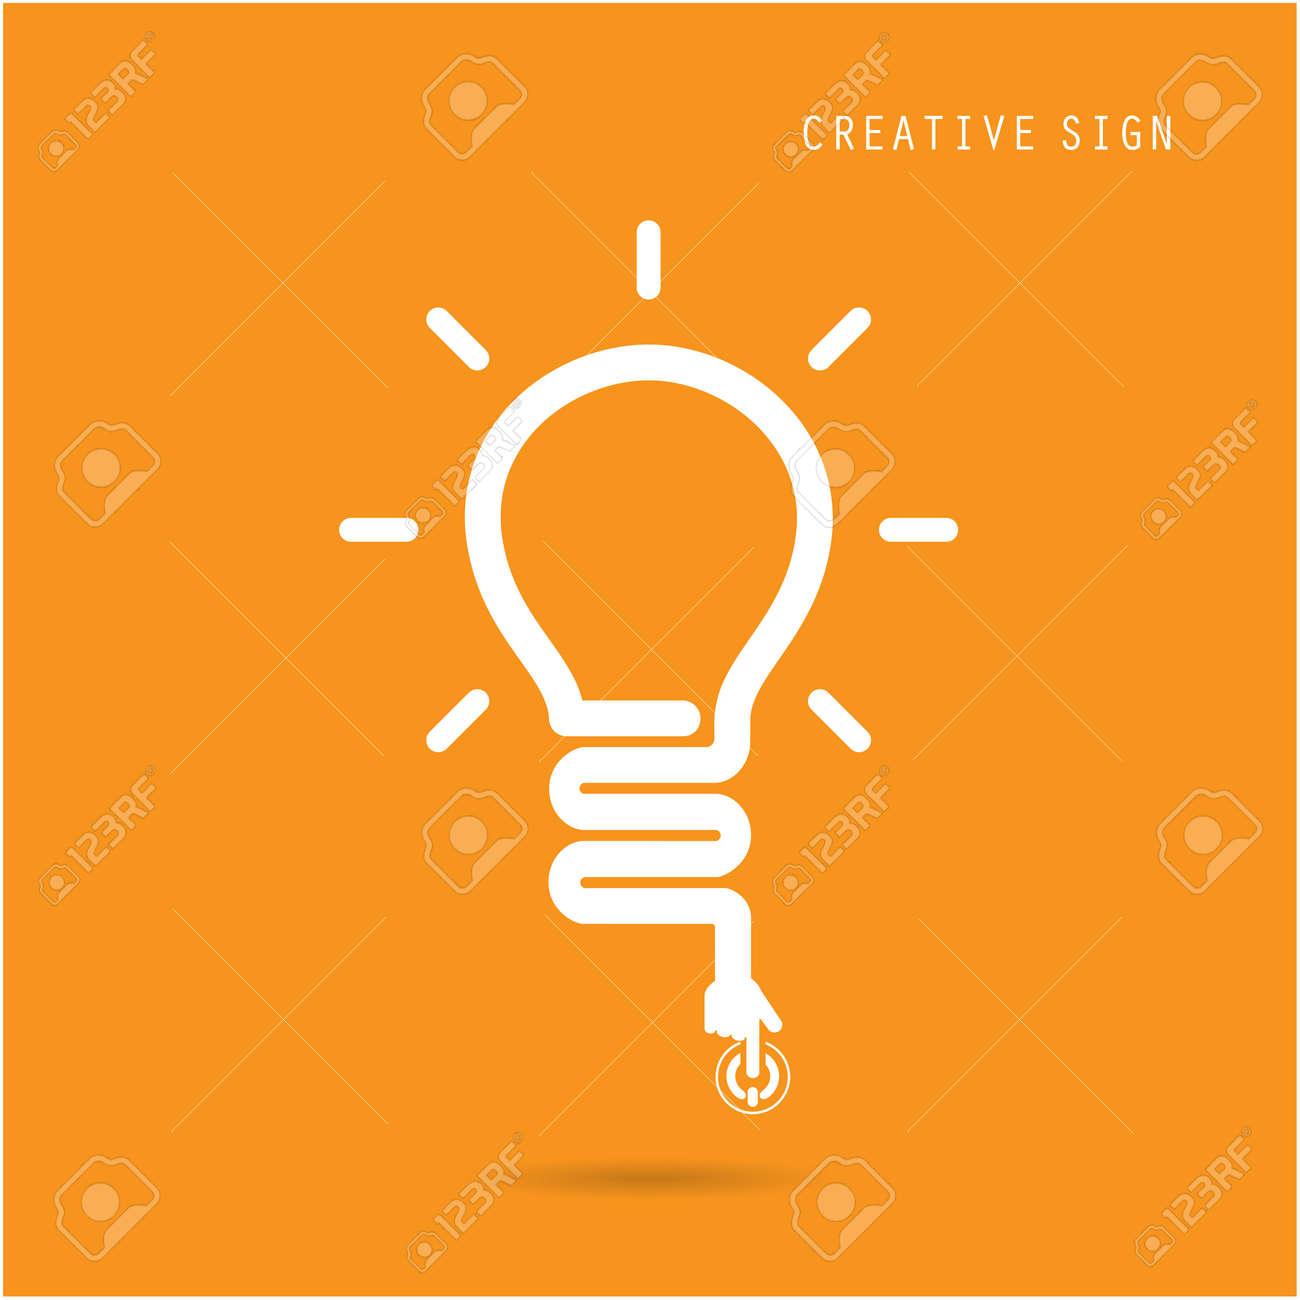 Creative light bulb concept, design for poster flyer cover brochure, business idea, education concept.vector illustration - 36115067